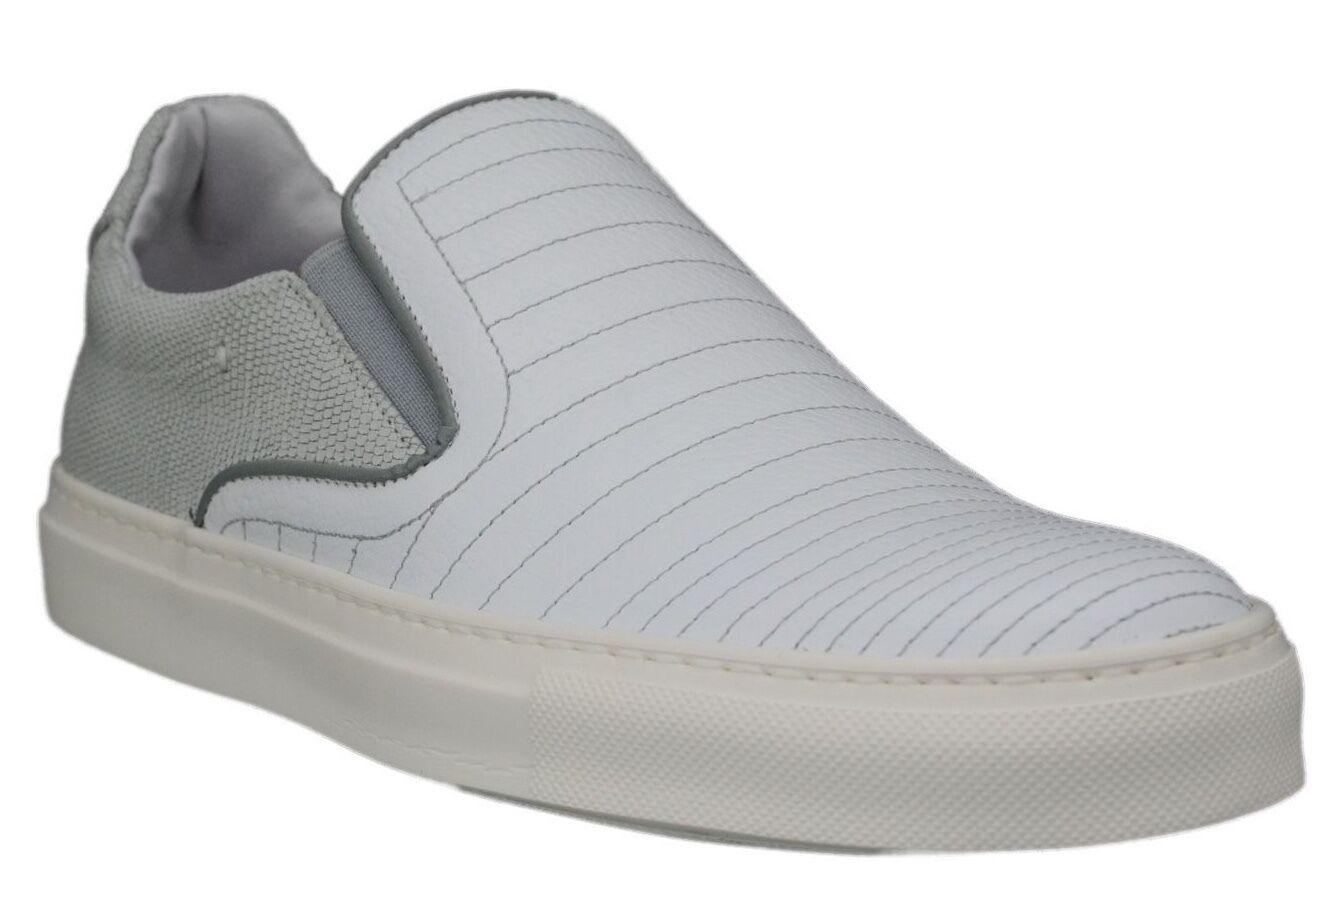 Scarpe casual da uomo  uomos Kenneth Cole New York Team Work White Slip On Sneakers